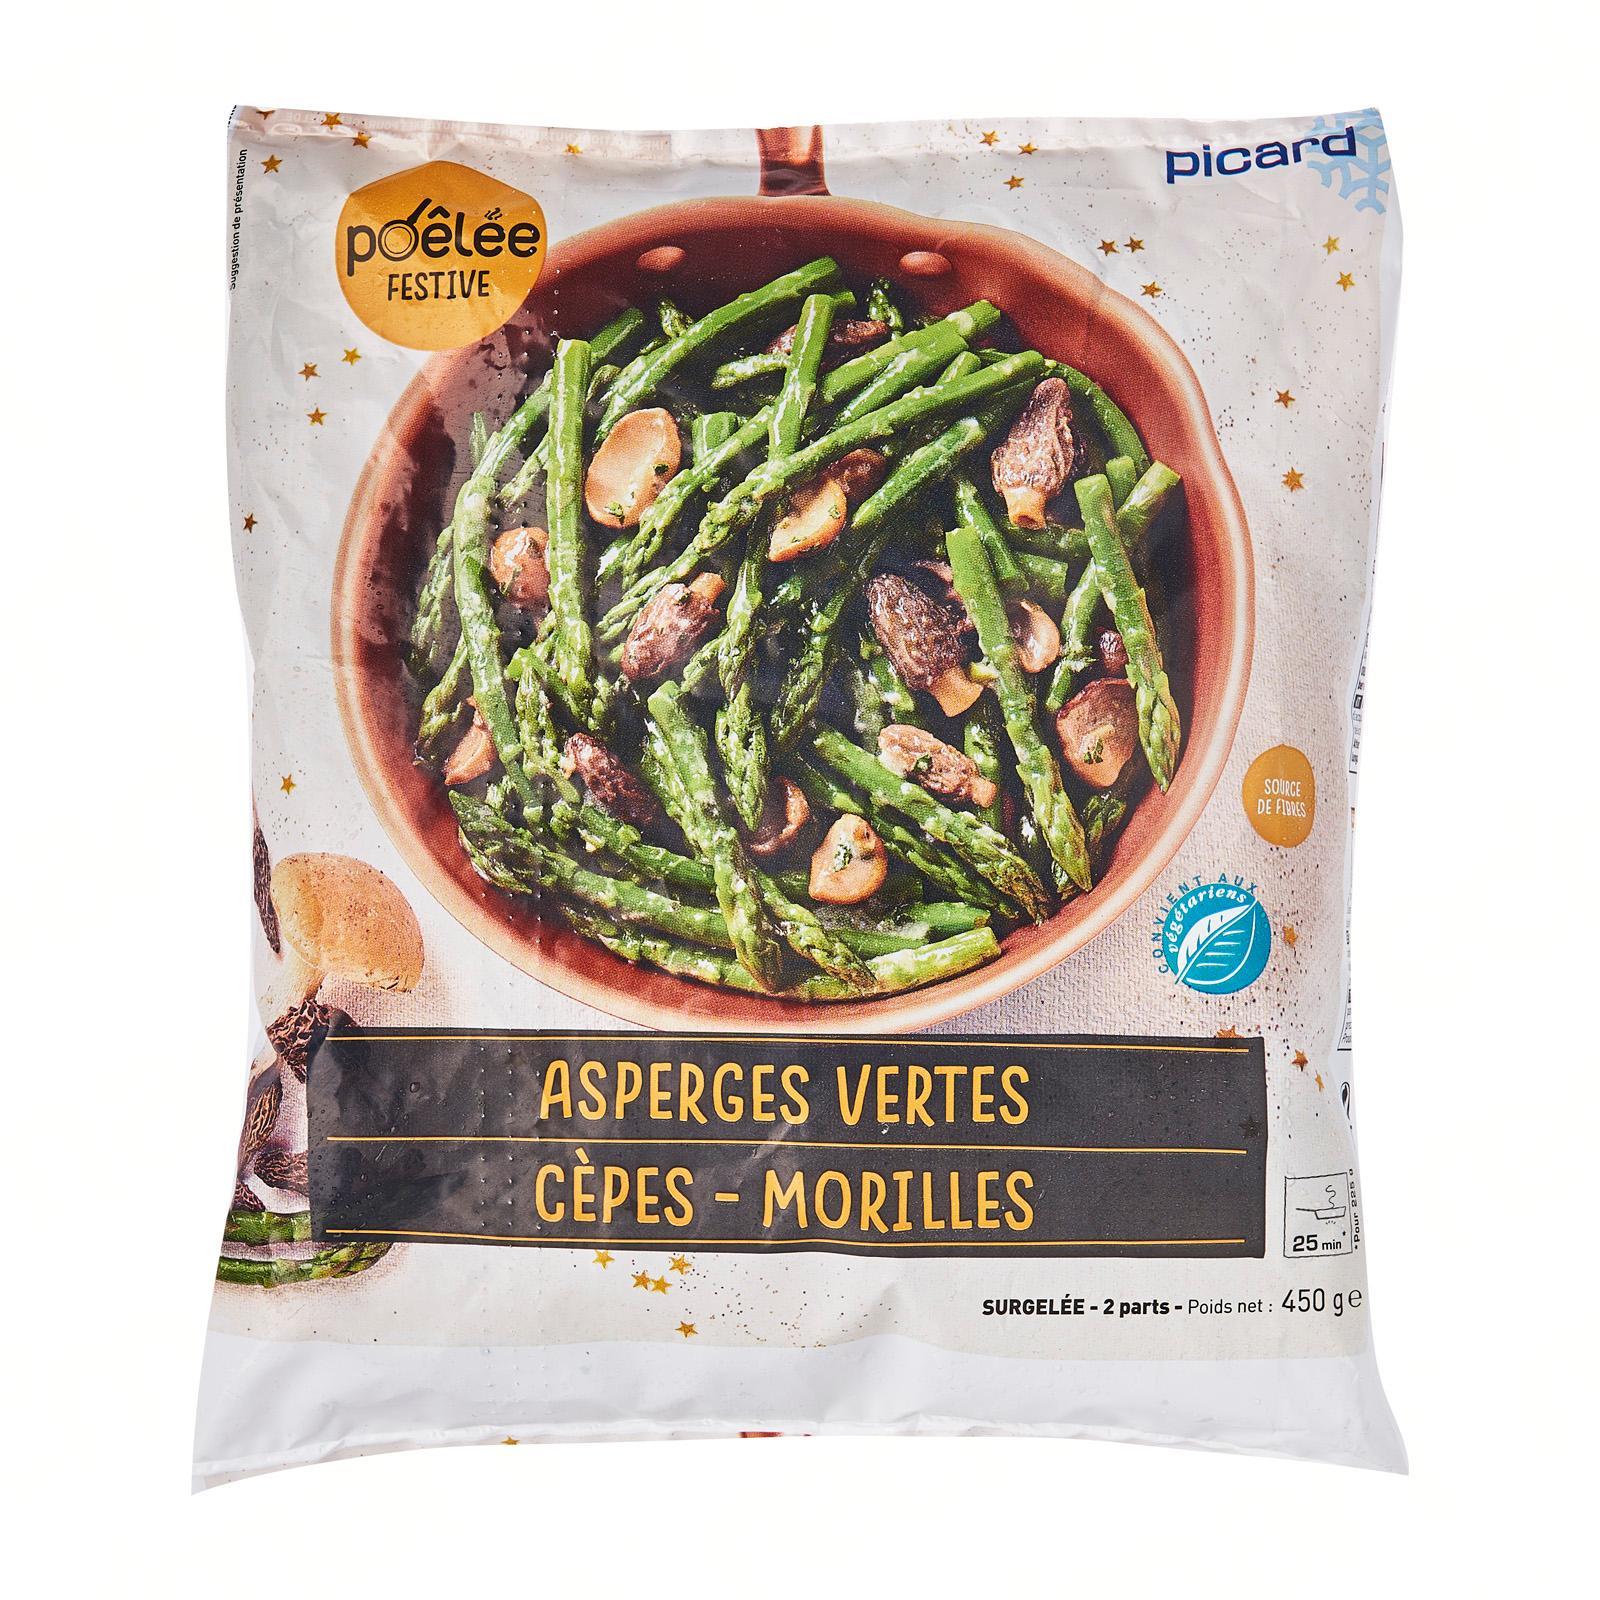 Picard Asparagus Morels and Porcini Mix - Frozen